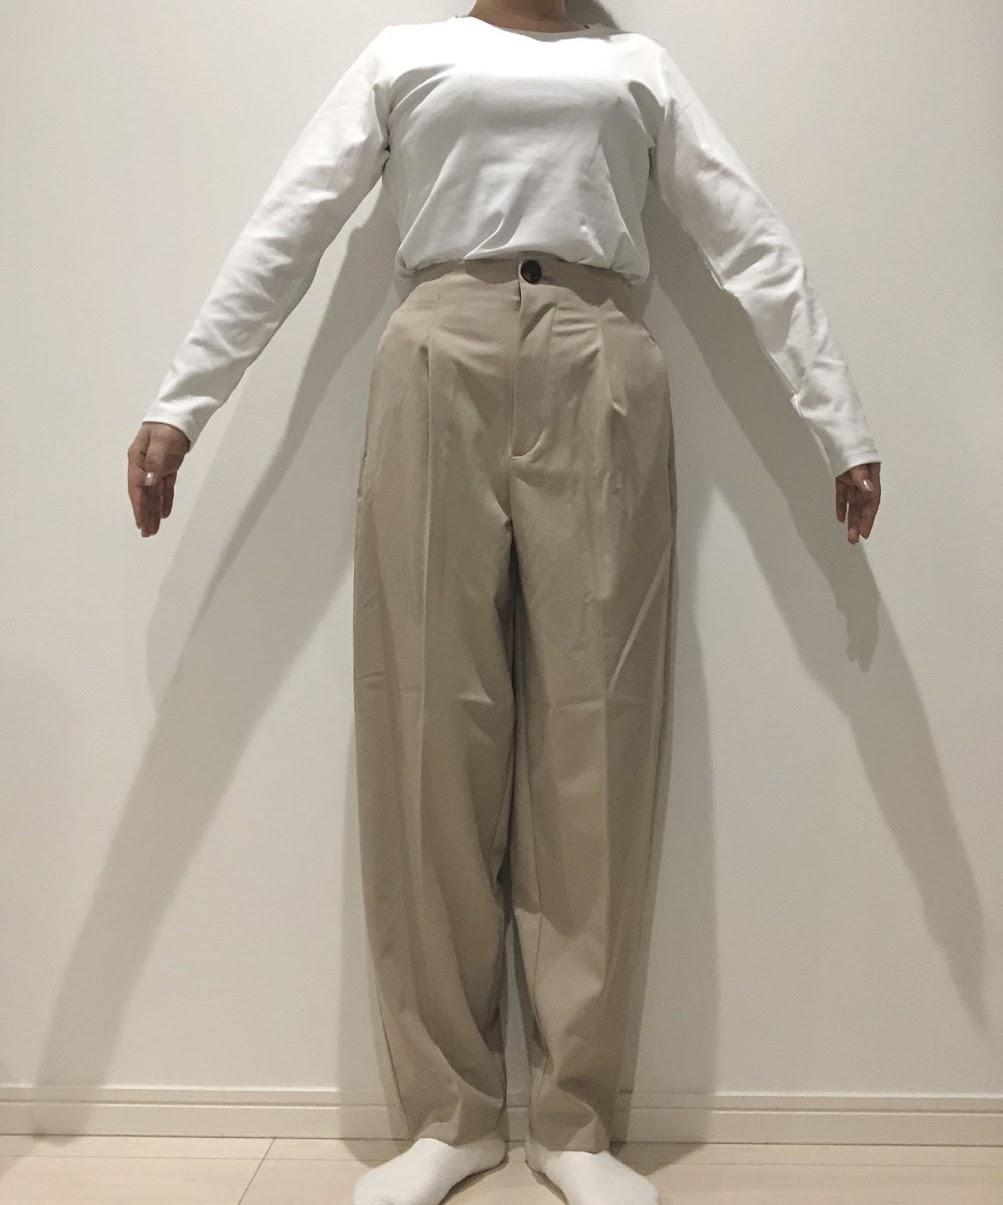 Gu タック コクーン シルエット パンツ 2020年トレンドNO.1はコクーンパンツ!GU・ユニクロで見つけた完売予想ボトムス4選 (2020年01月14日)